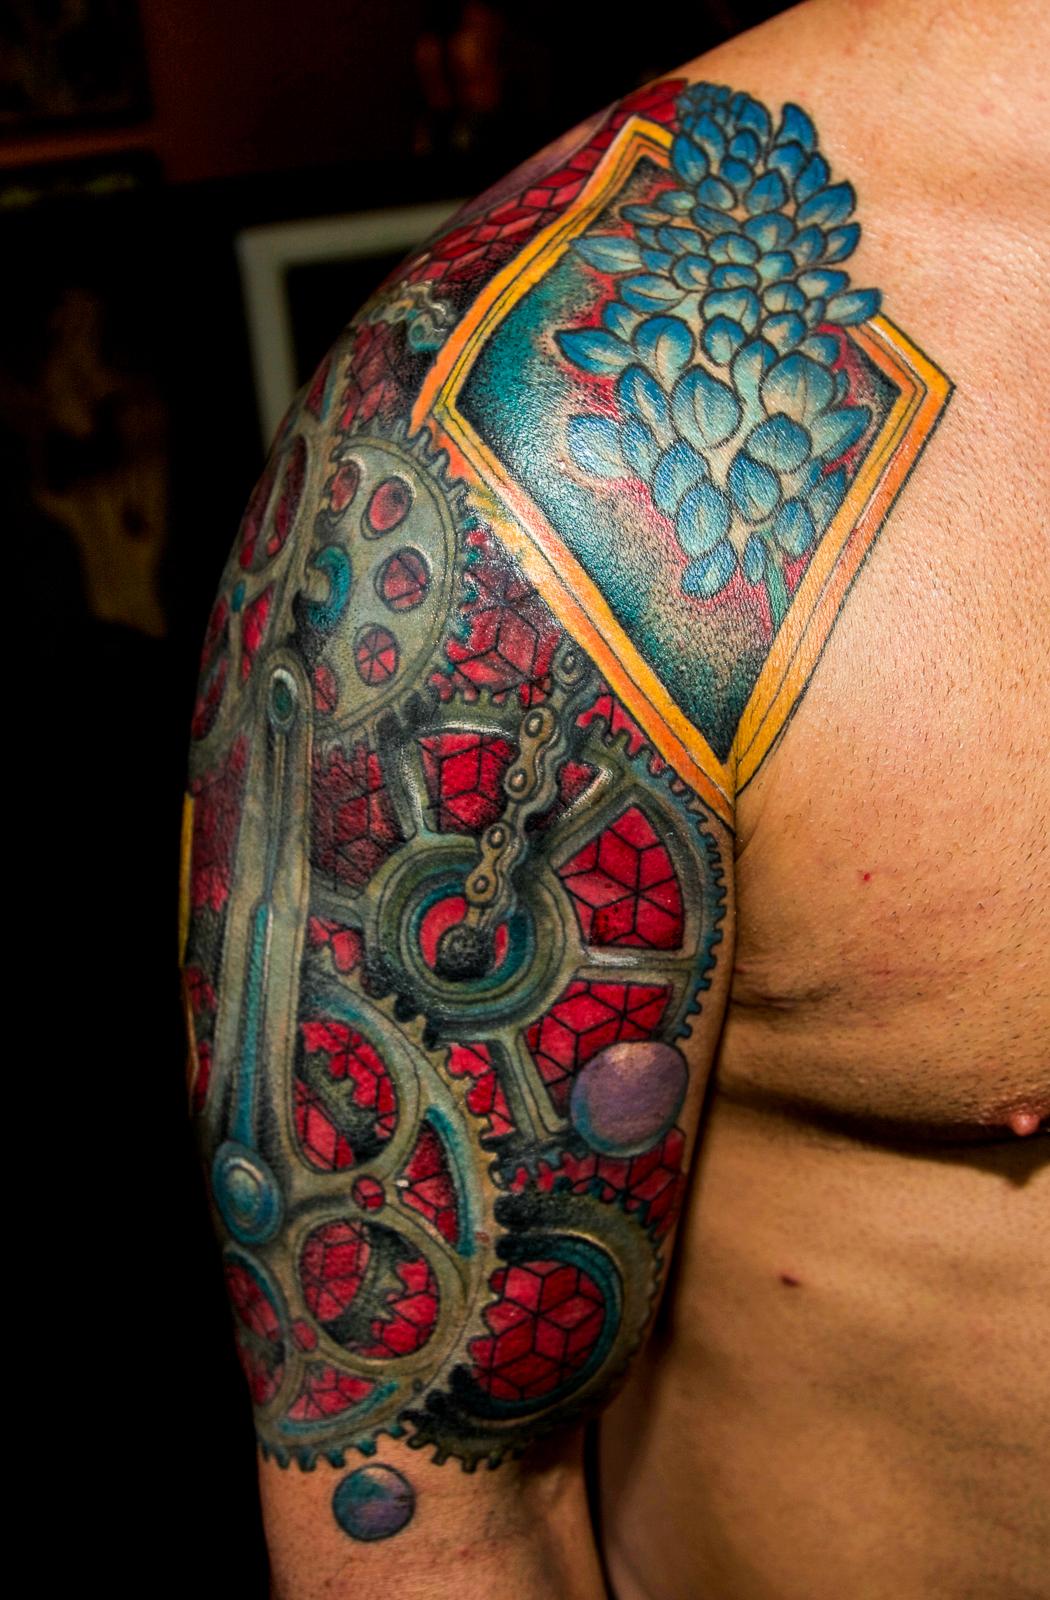 Bike Gears cover up 1 enrique bernal ejay tattoo.jpg